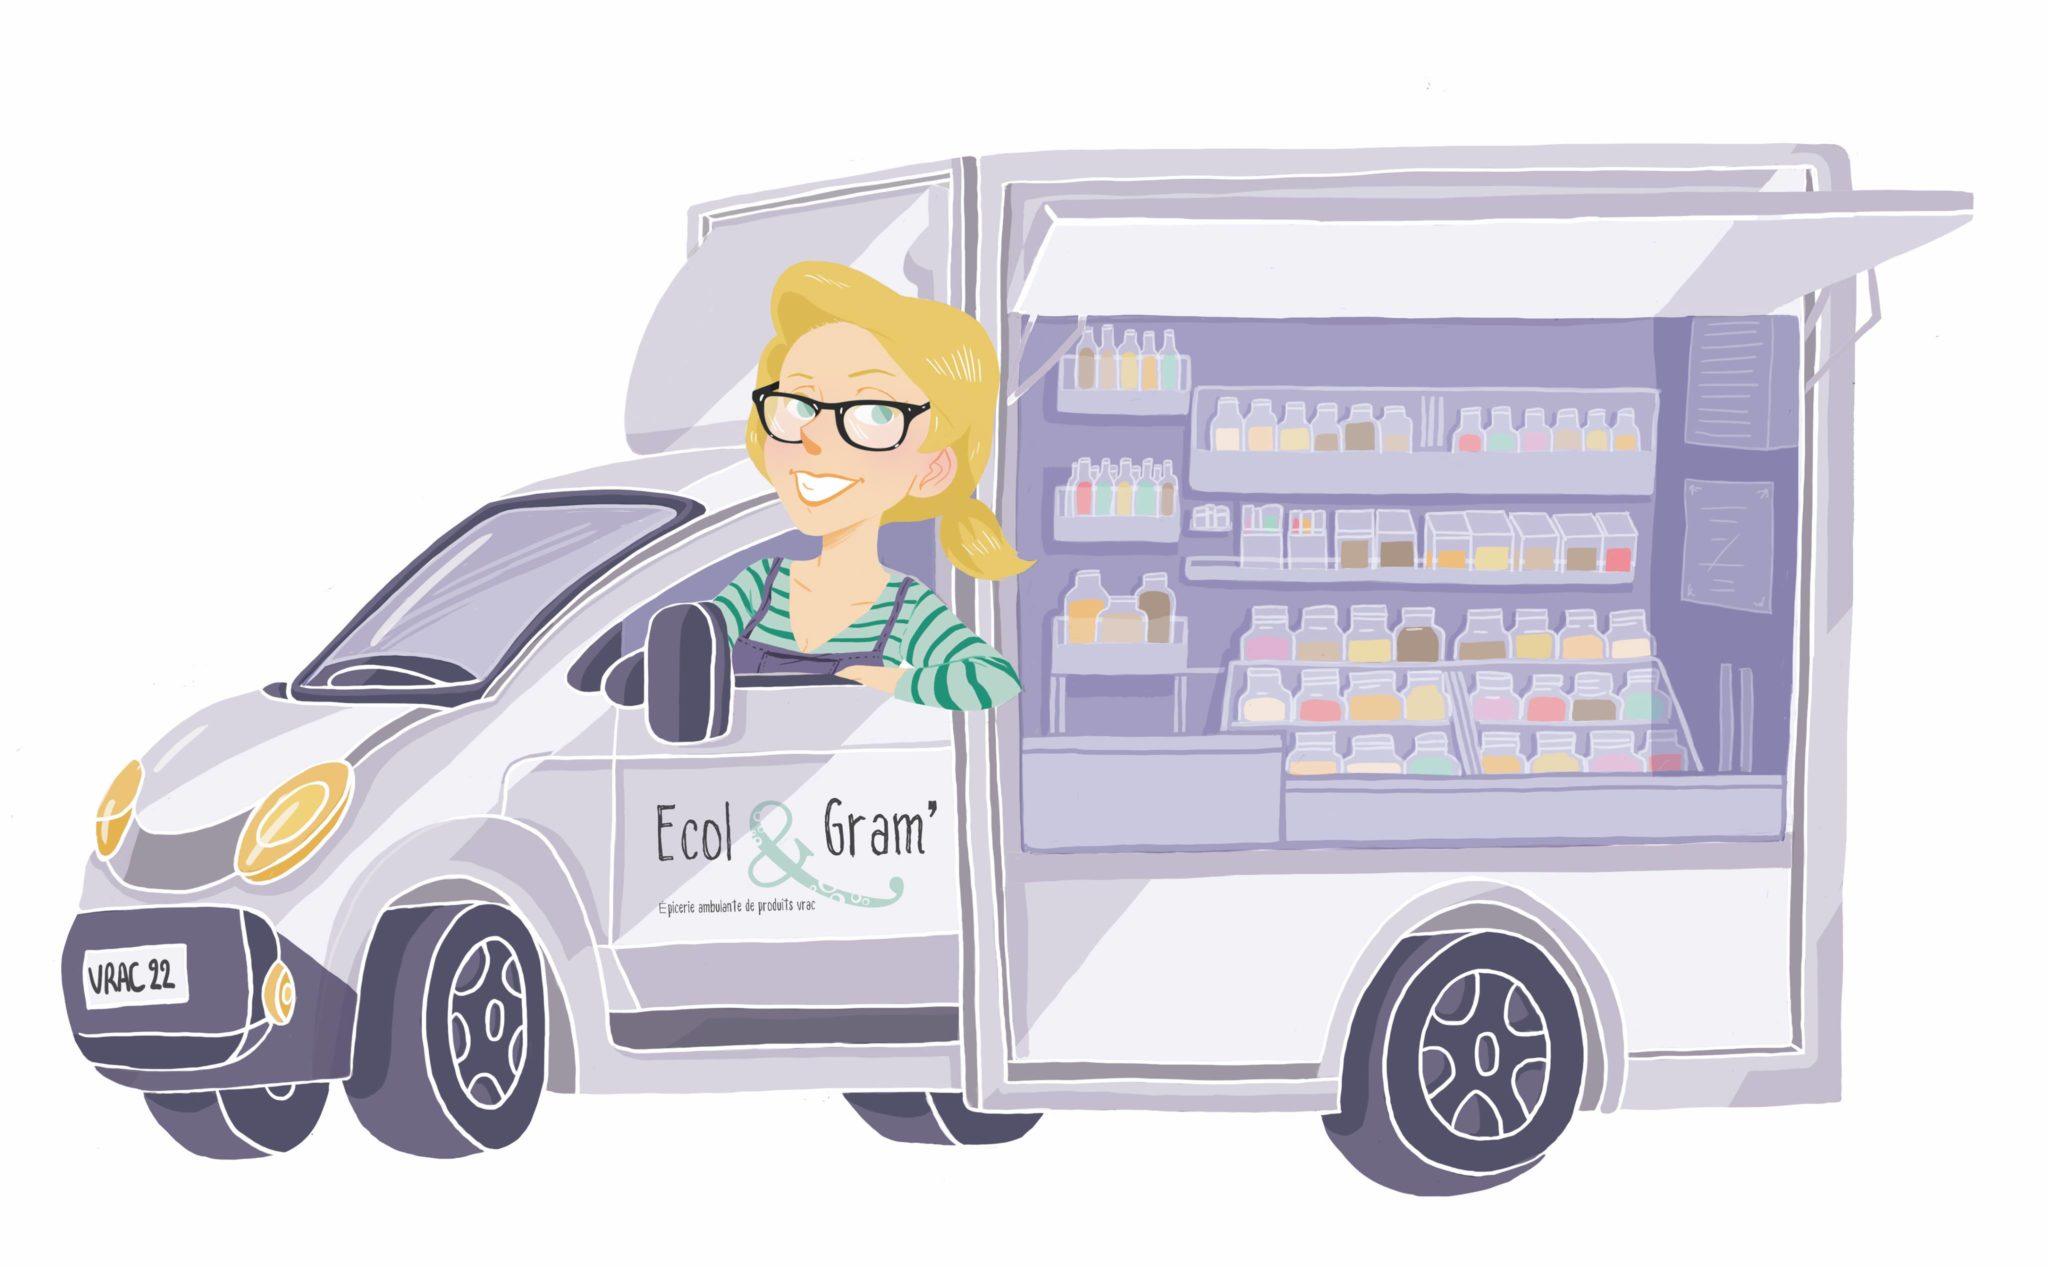 dessin du camion ecol et gram